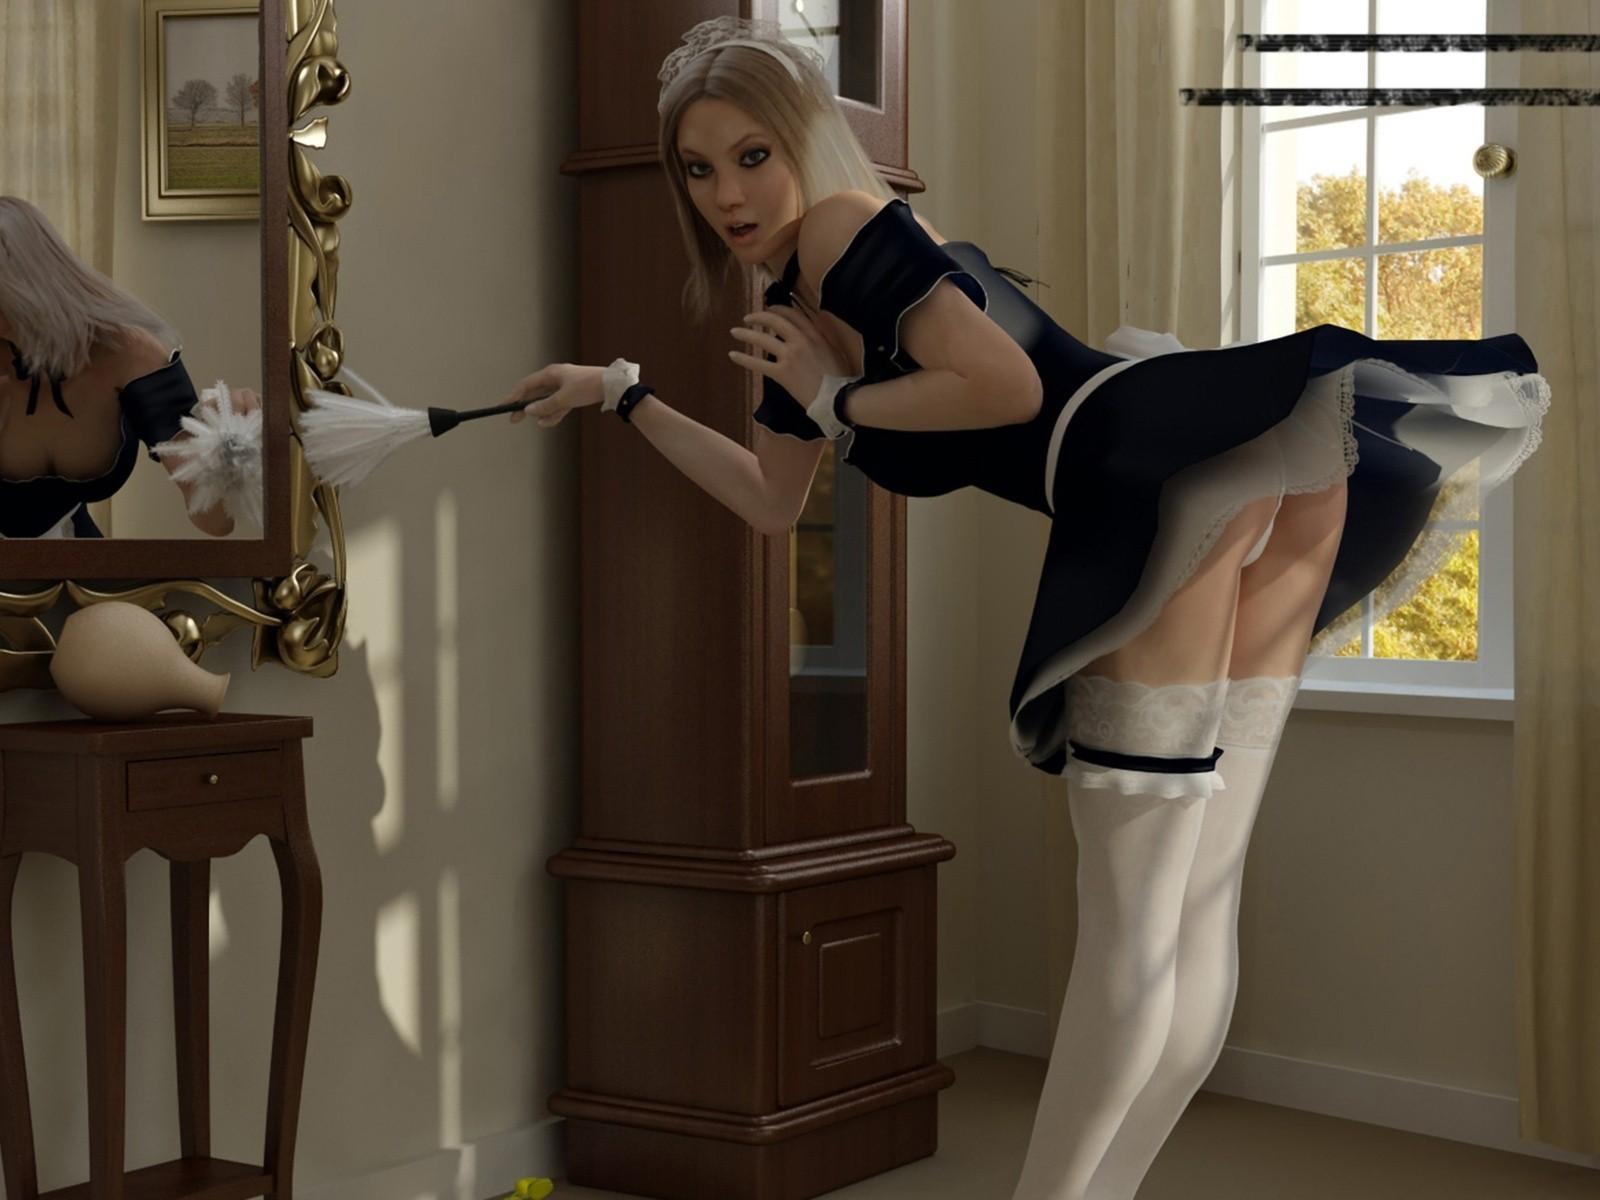 Charlotte Springer Maids Stockings Girls Legs Erotic Pics Hq